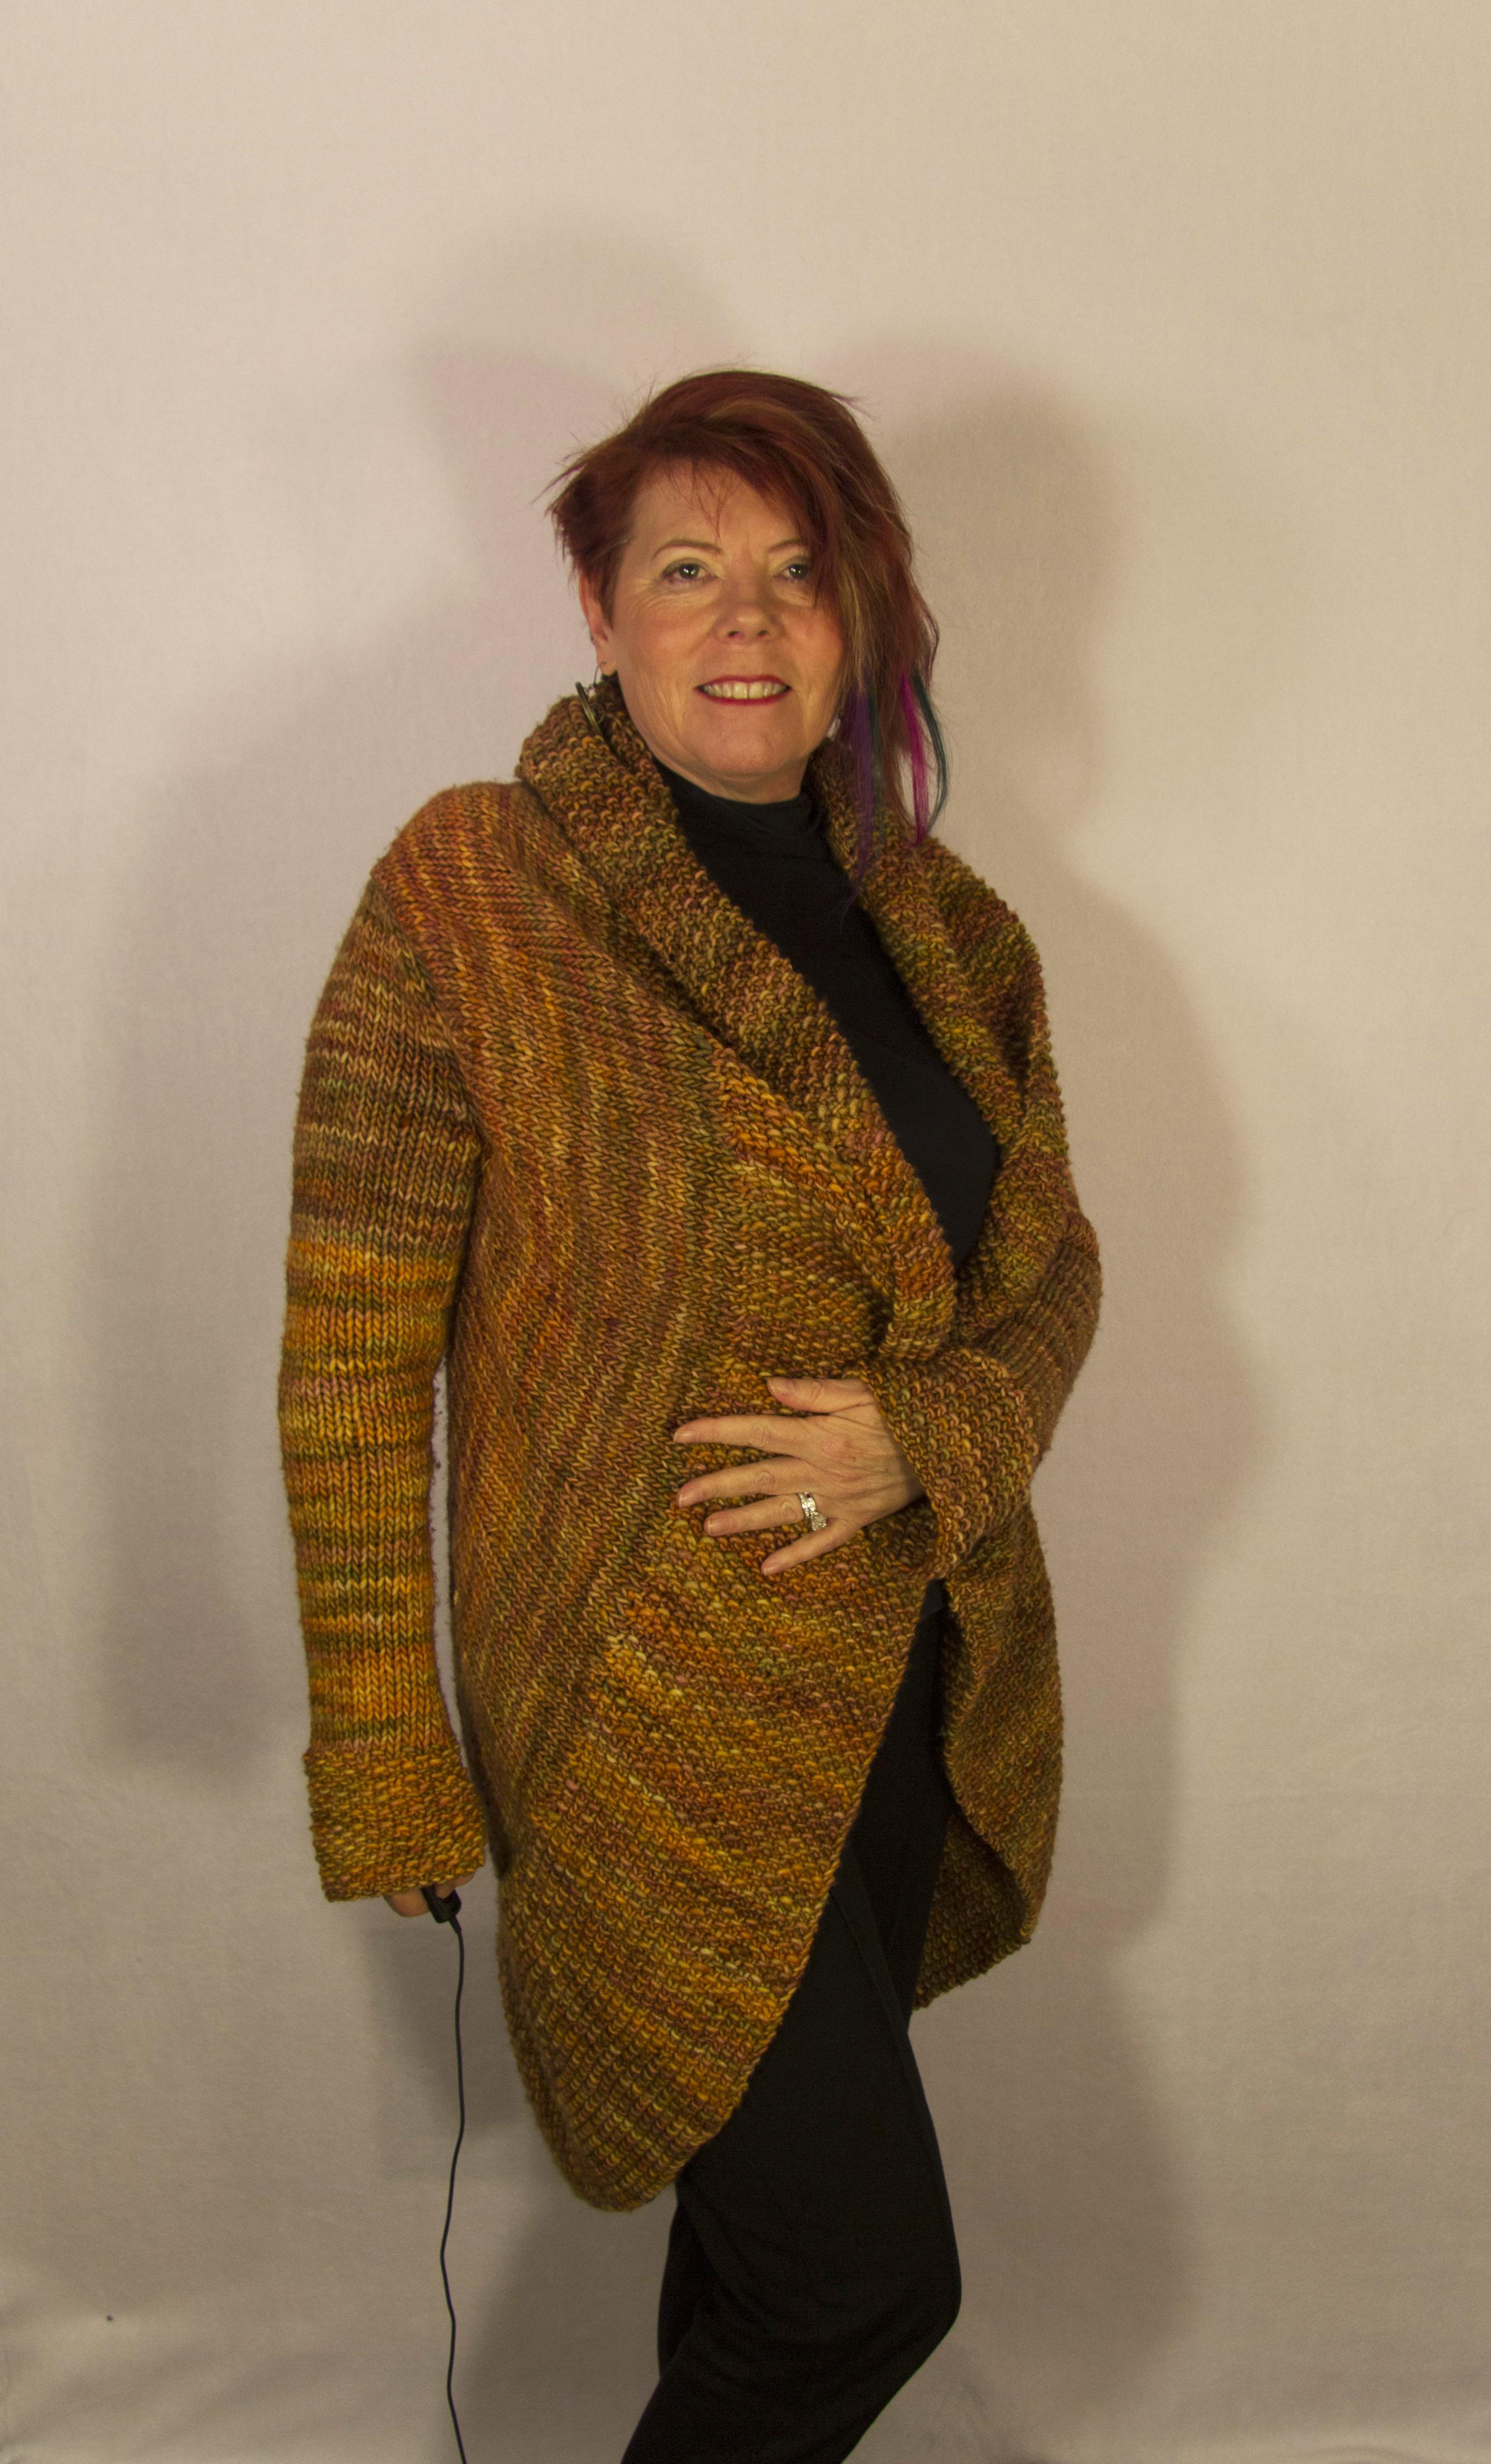 Warm Circle Sweater to Celebrate 2014!   West Zen Studio